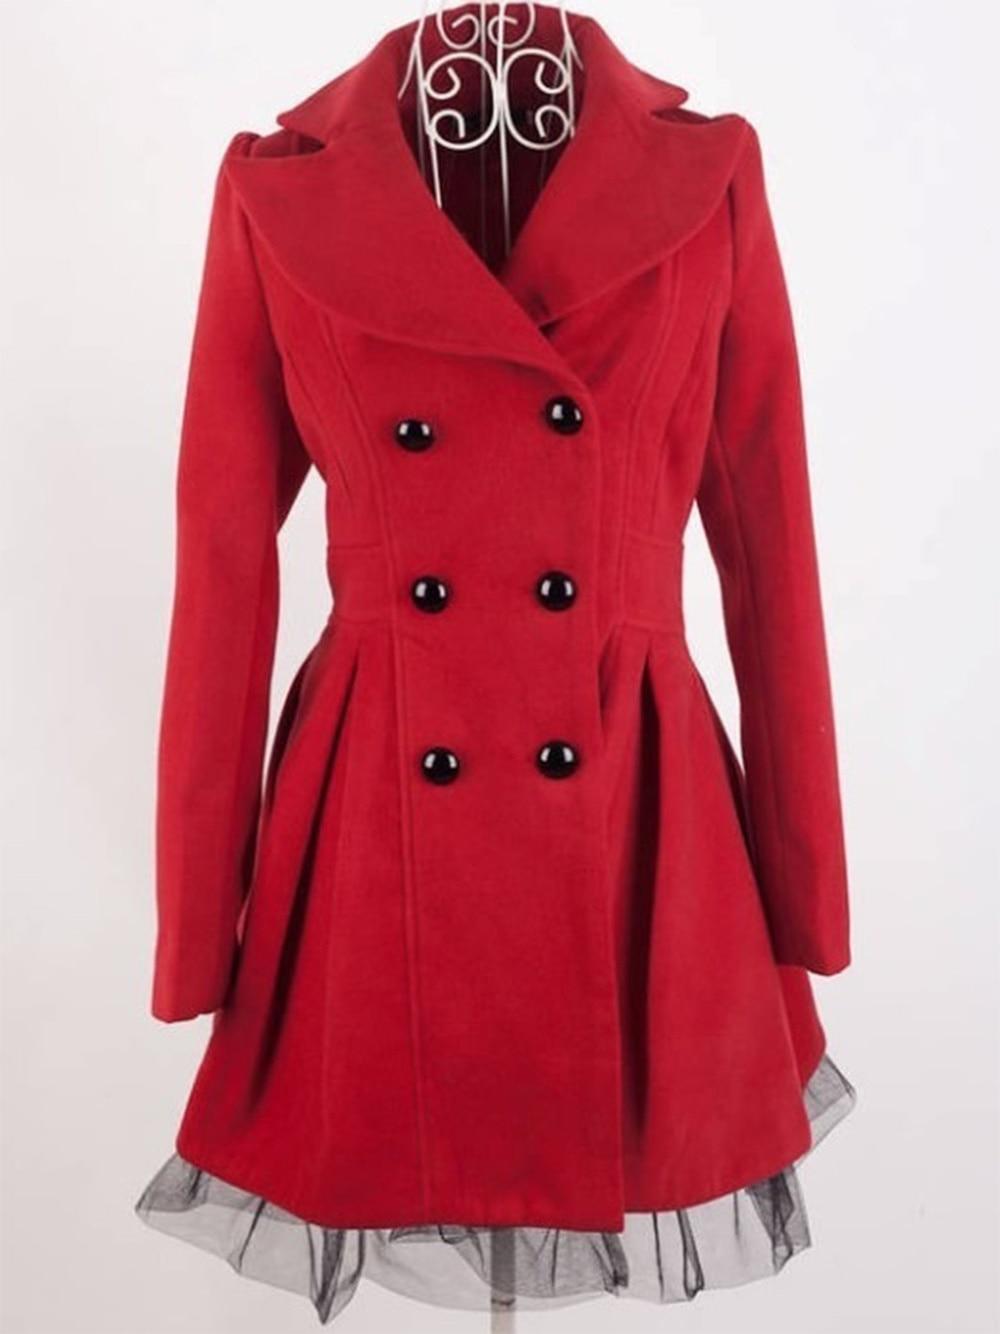 ZOGAA Women's Woolen Dress Coat Solid Lace Hem Steampunk Victorian Swallow Tail   Trench   Coat Double-Breasted Female Long Coat